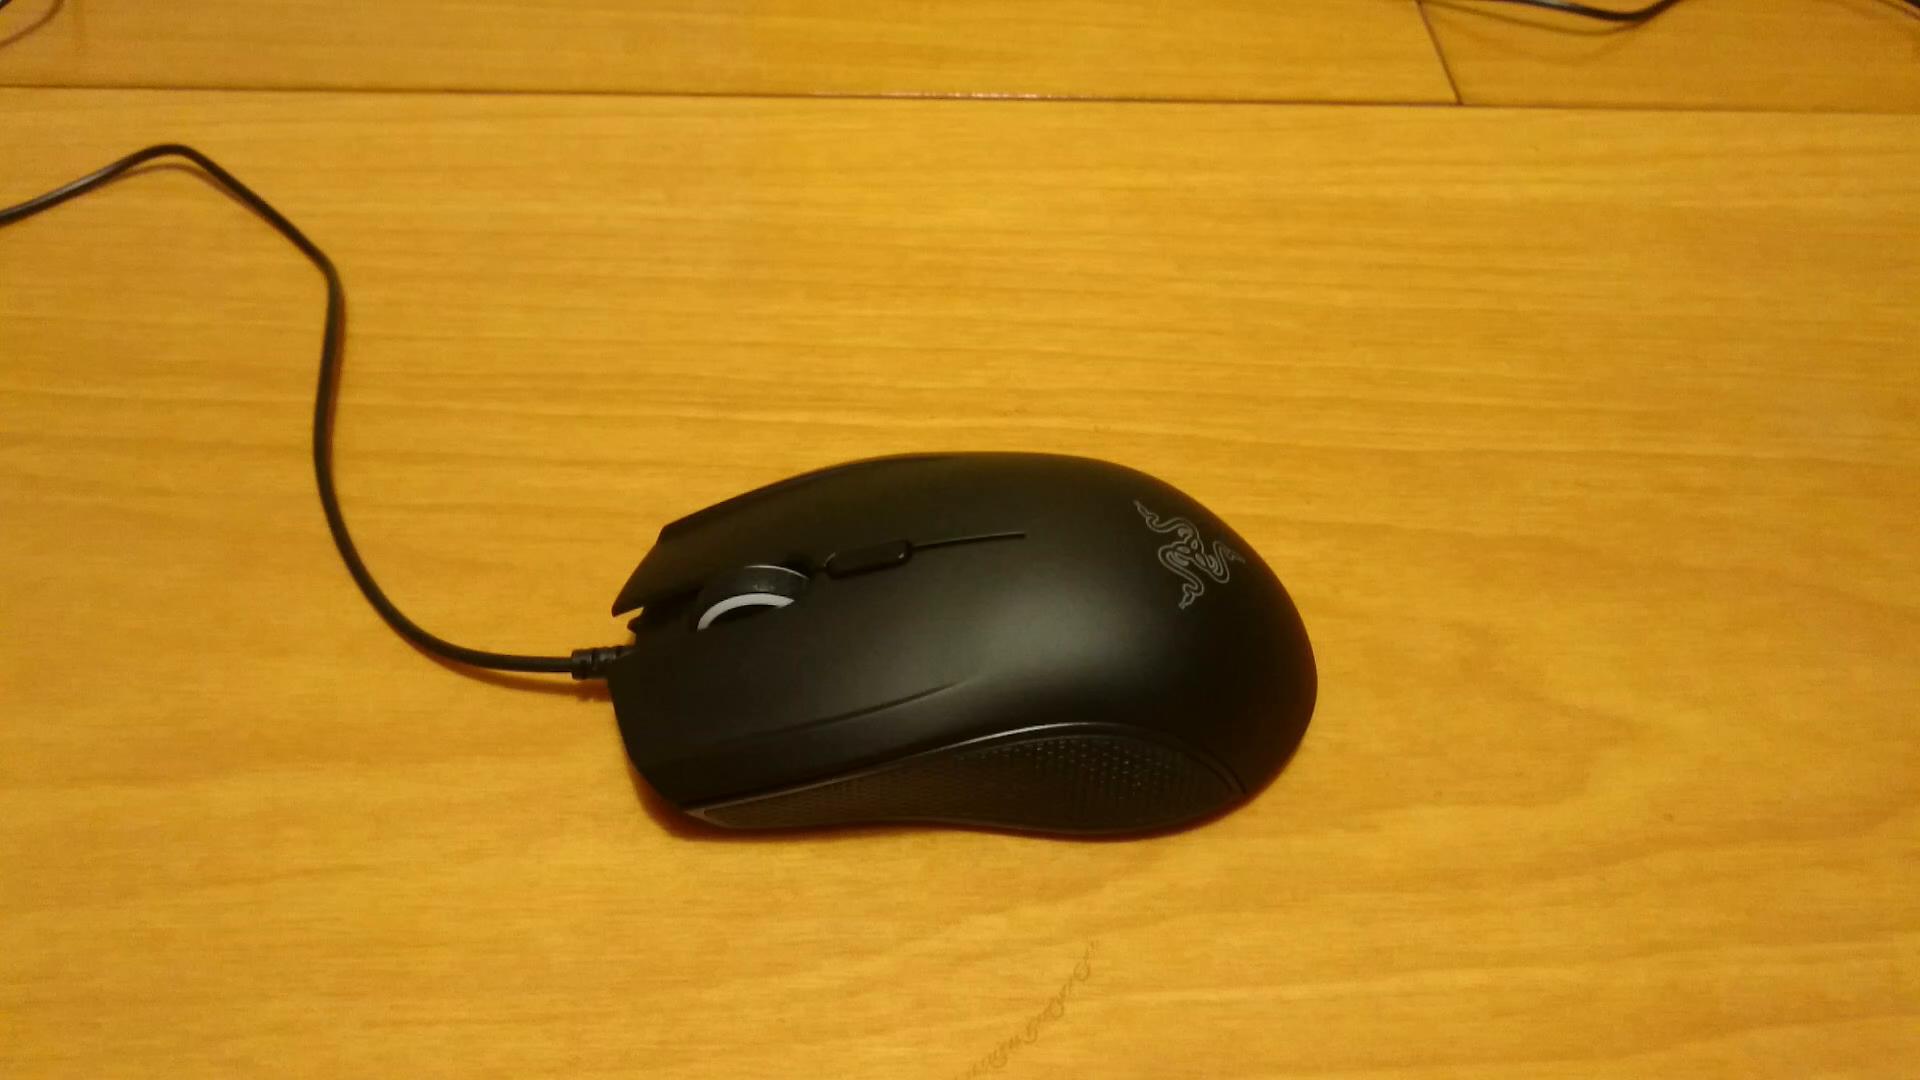 Amazon.it:recensioni clienti: razer abyssus v2 gaming mouse